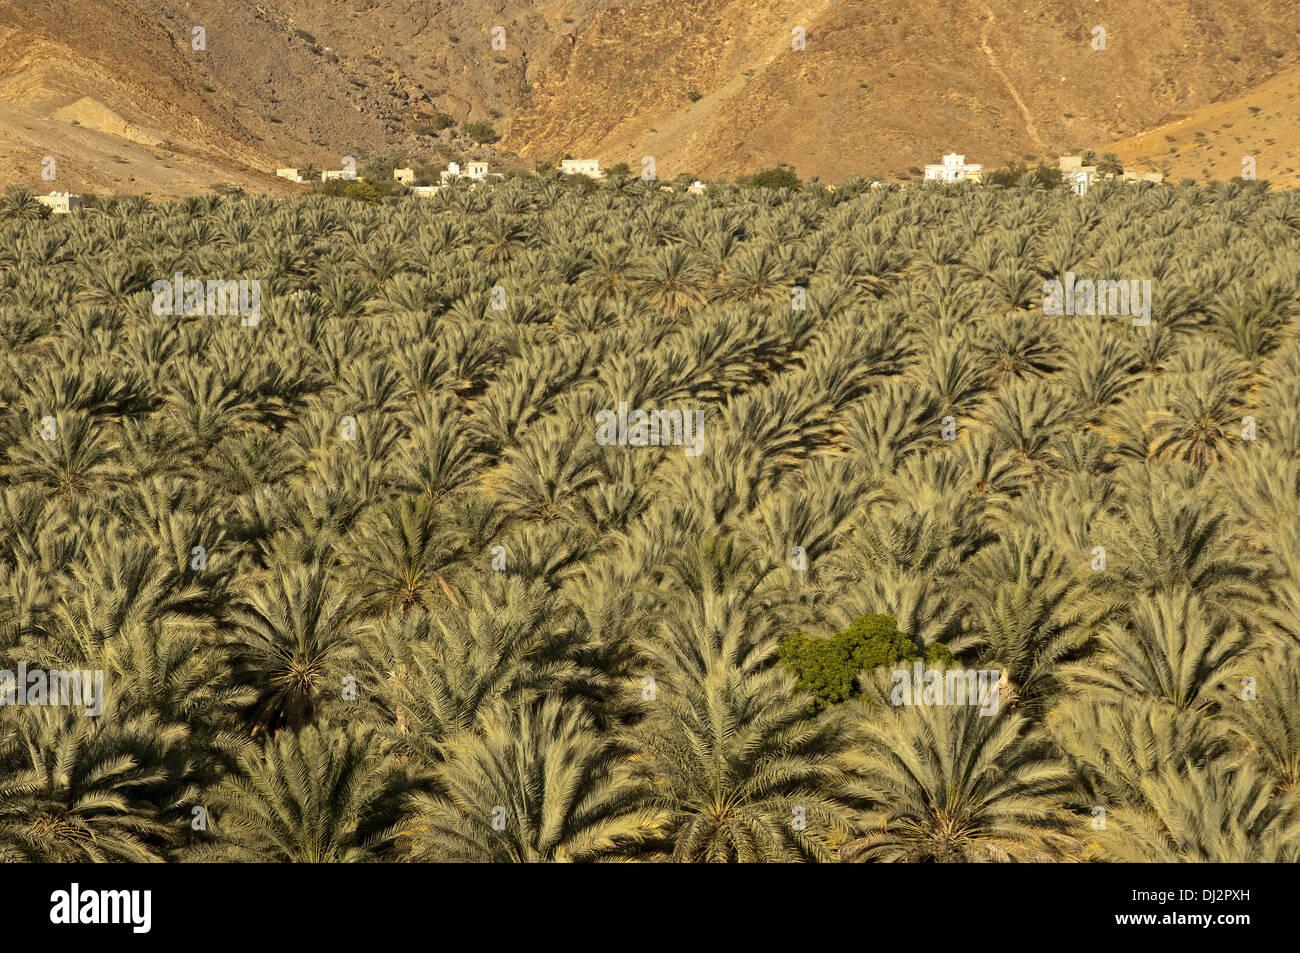 Plantation of date palms, Al Hamra, Oman - Stock Image